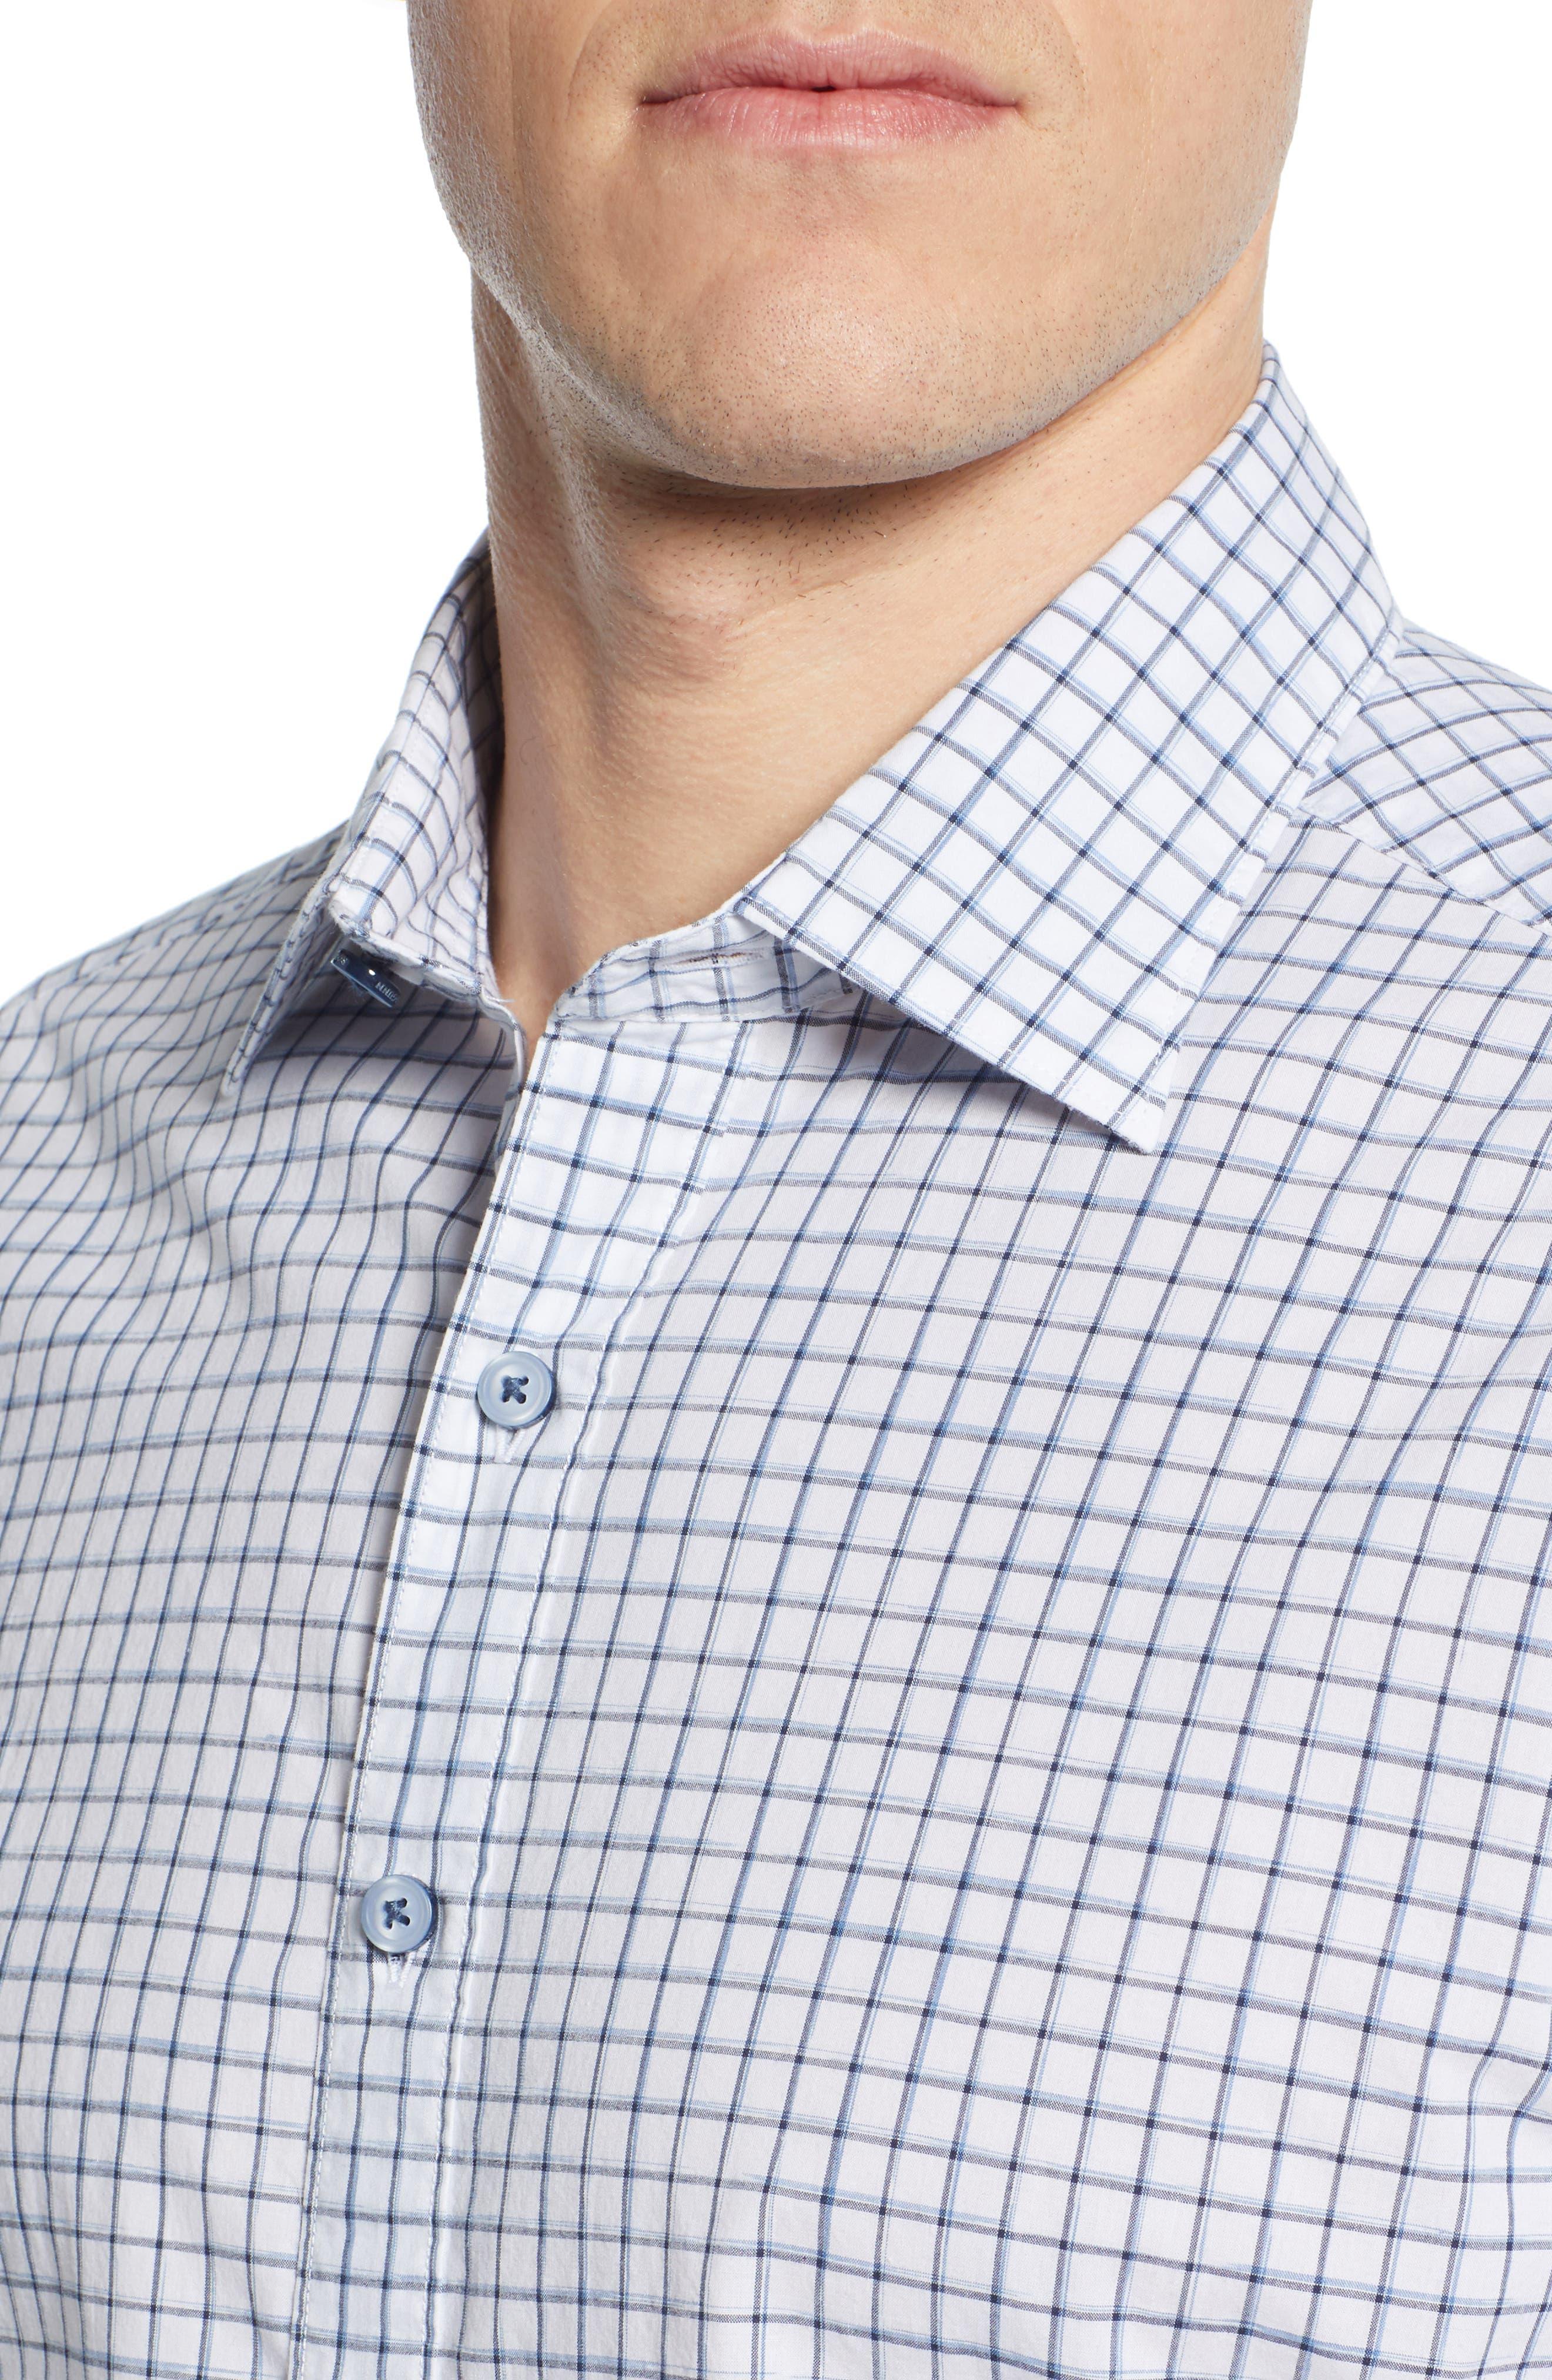 RODD & GUNN, Gowerville Regular Fit Check Sport Shirt, Alternate thumbnail 2, color, SNOW